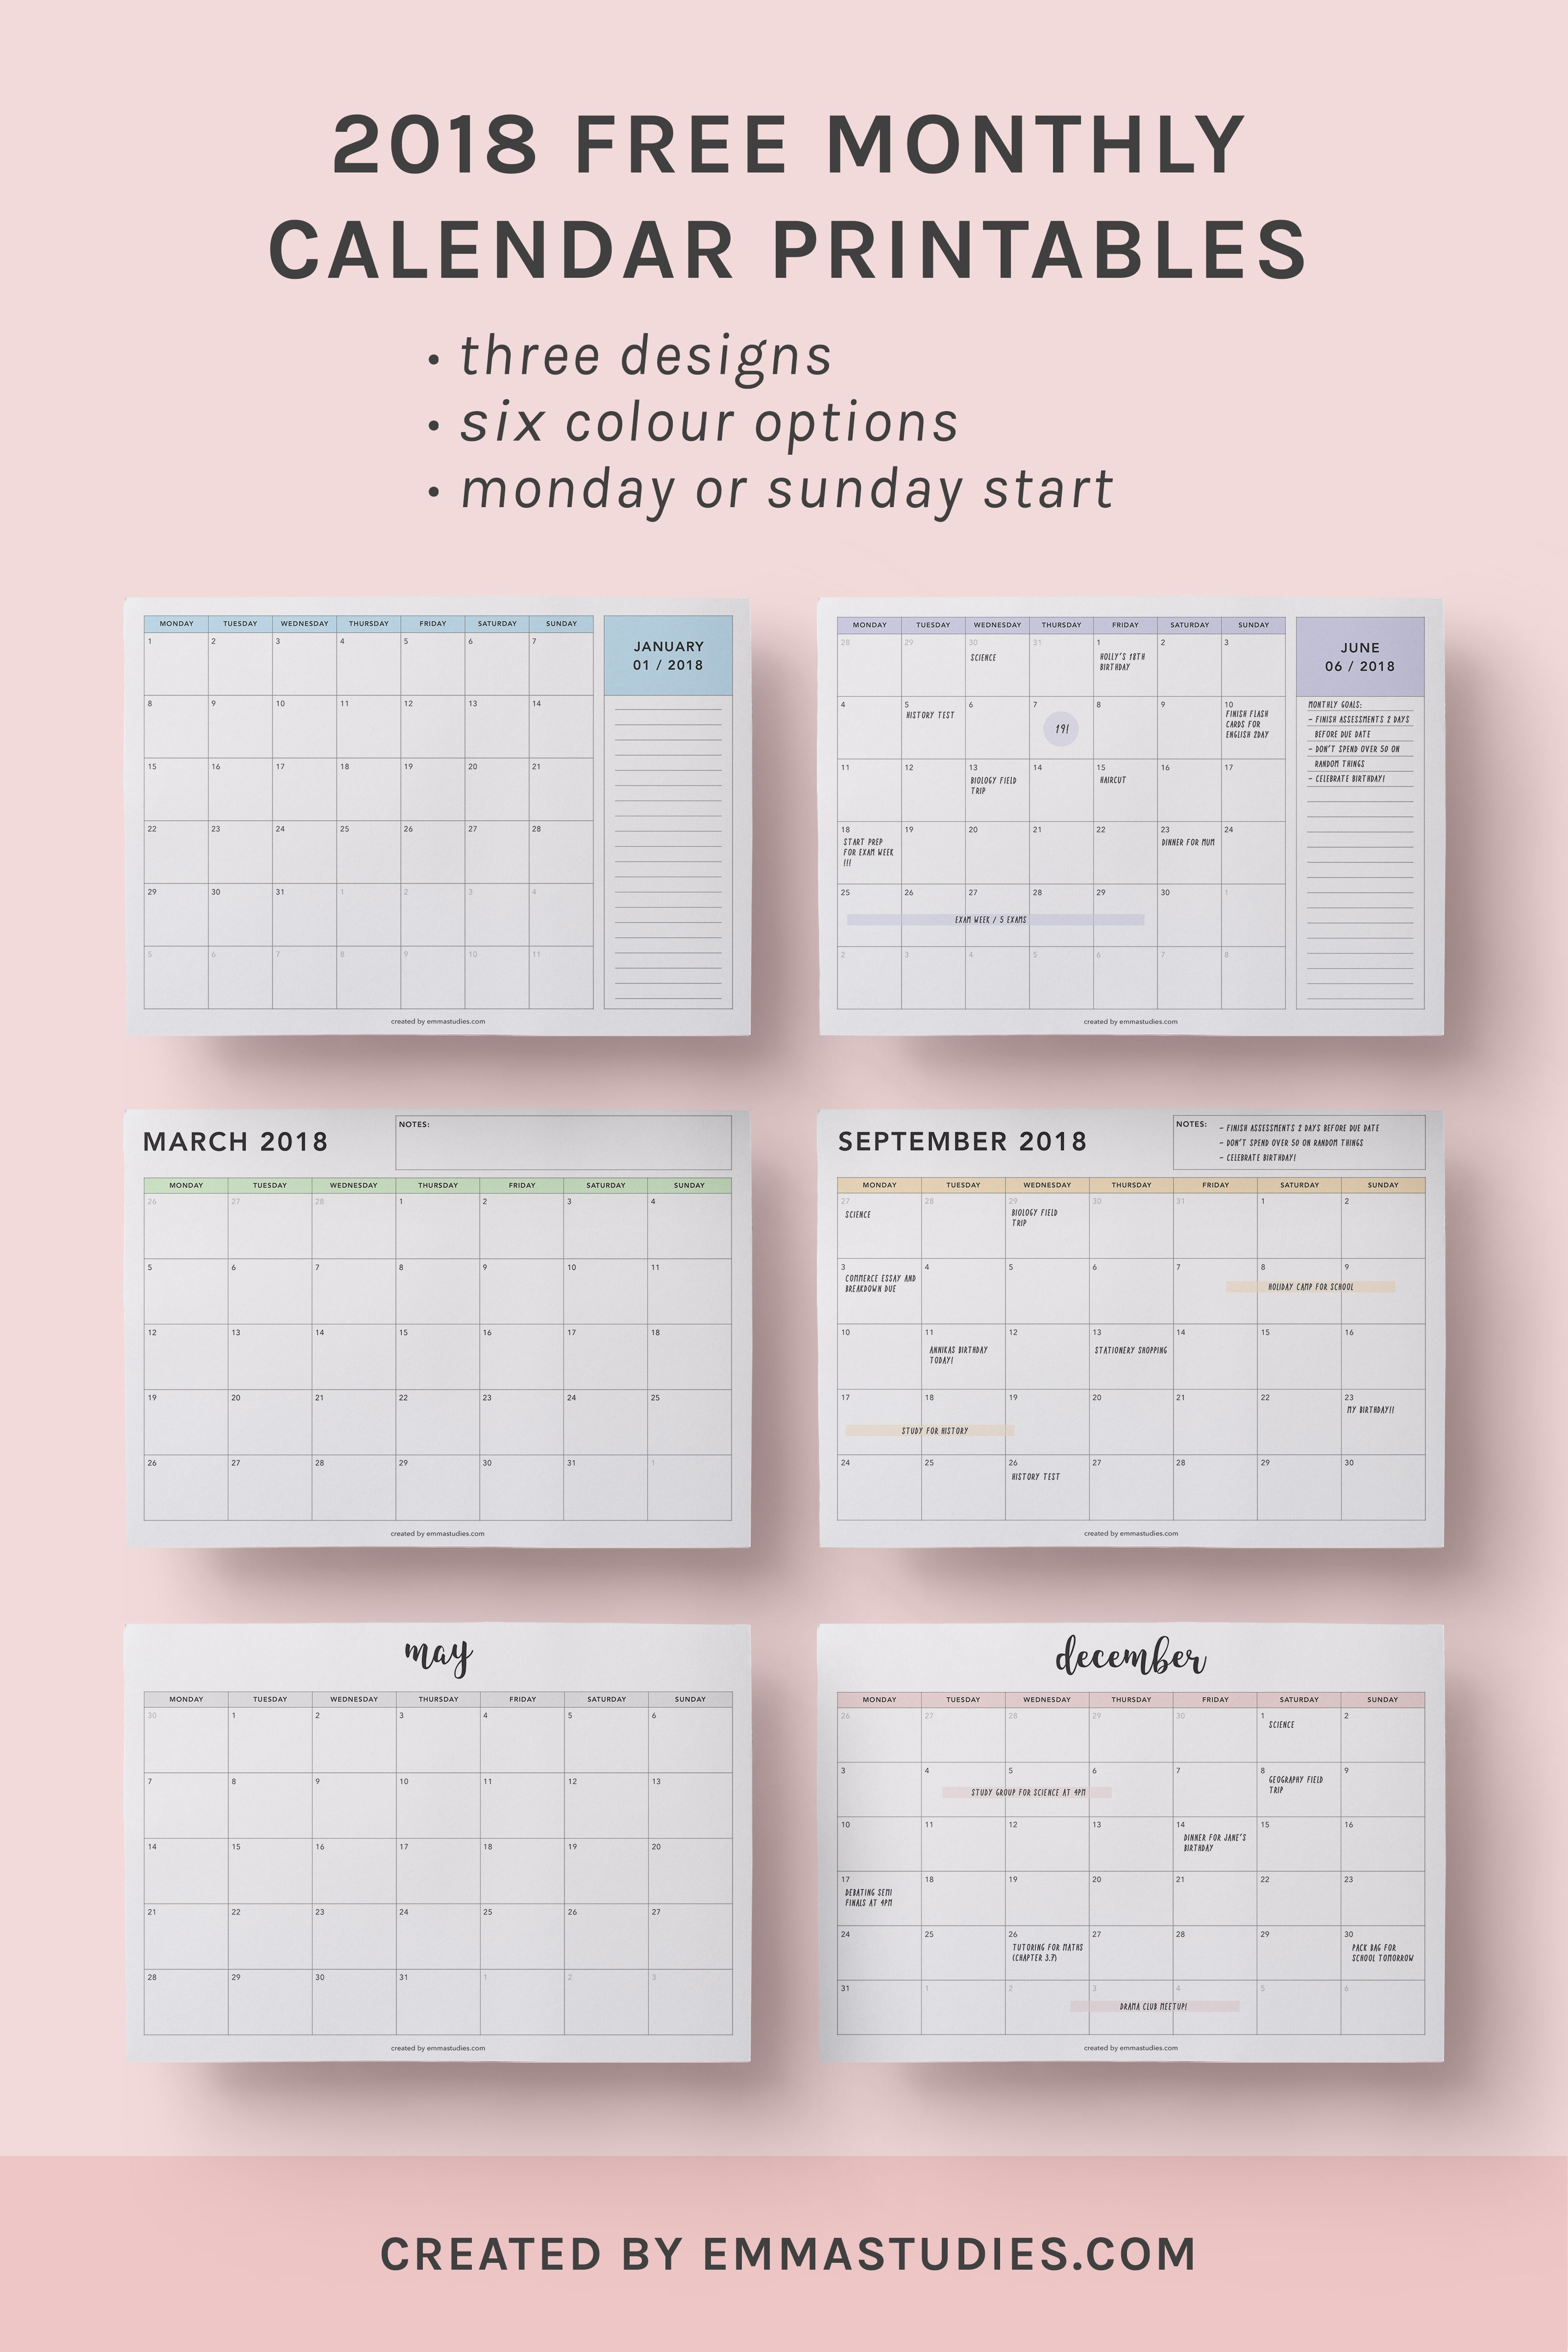 Monthly Free Printable Calendars By Emmastu S